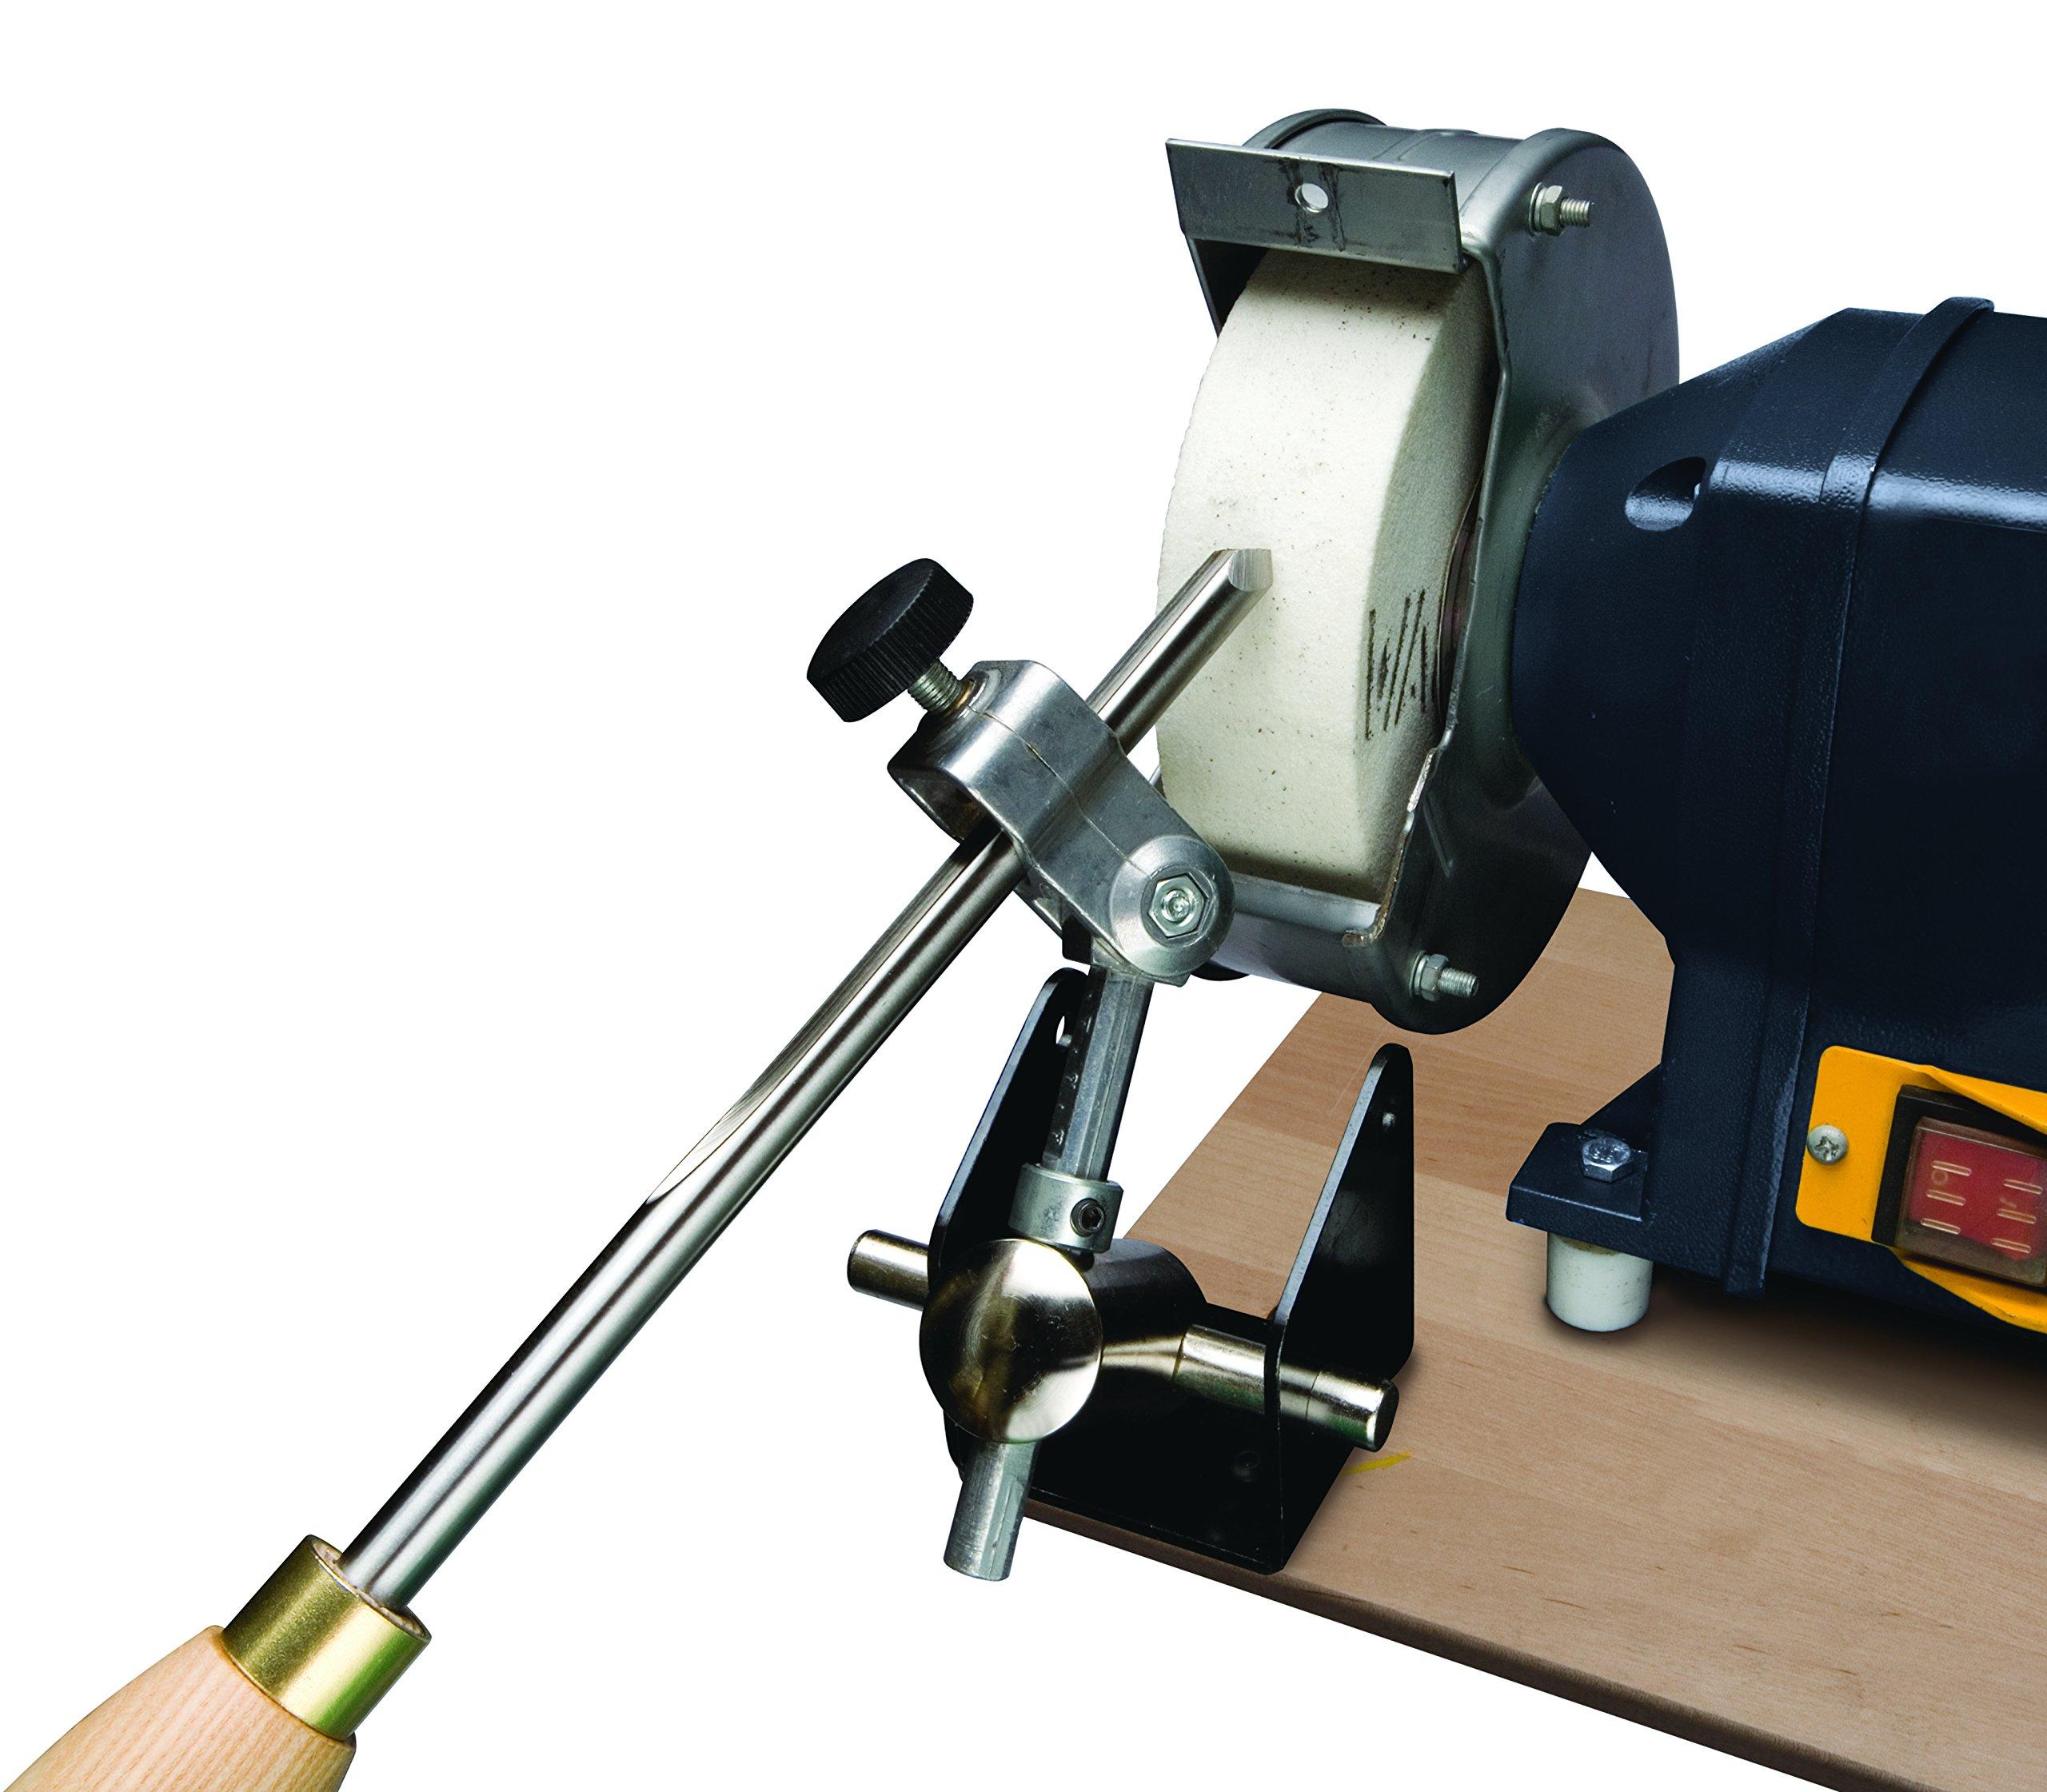 Robert Sorby # 445 Fingernail Profiler Sharpening Jig for Spindle and Bowl Gouges Works with Bench Grinders